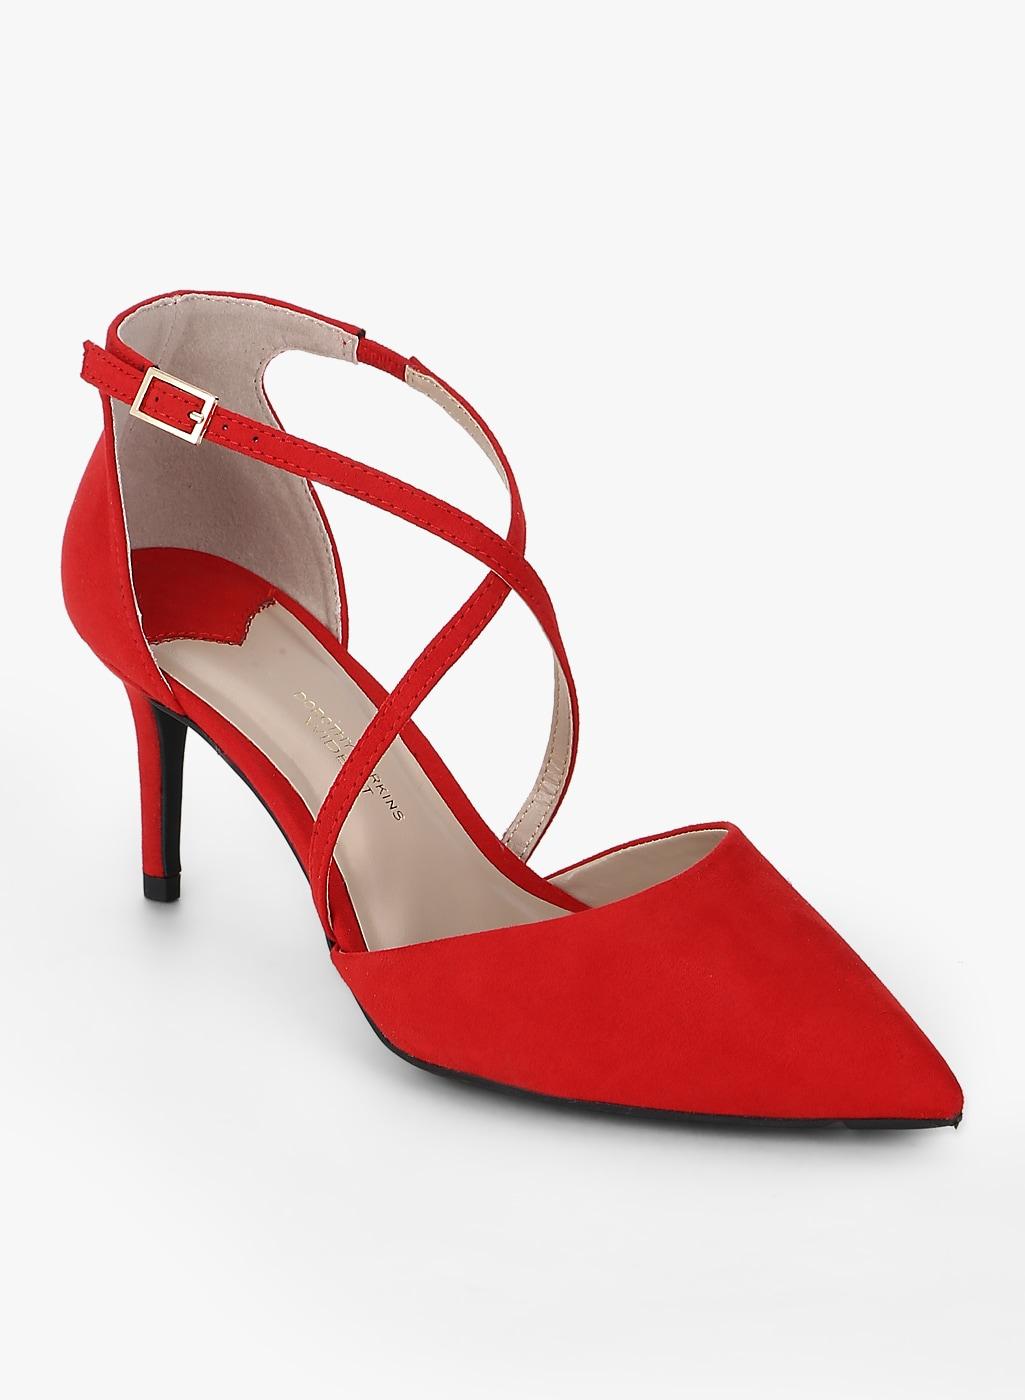 8f0dfa2279 ... Women Price in India. MYNTRA MYNTRA. Dorothy Perkins Elsa Red Sandals